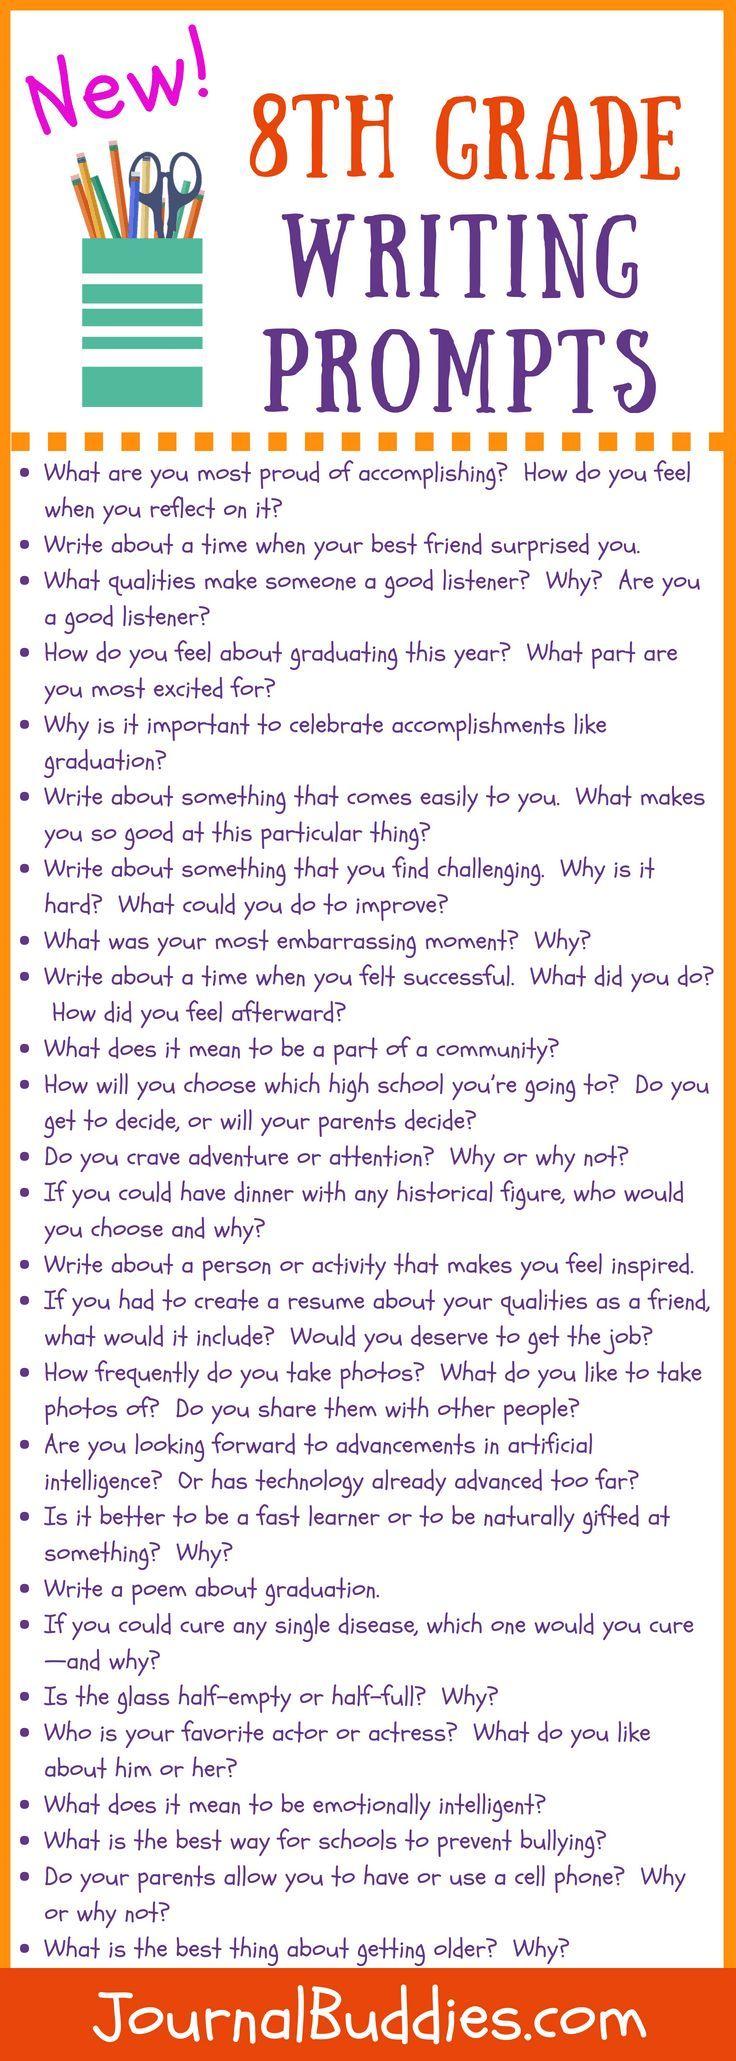 New 8th Grade Writing Prompts 8th Grade Writing Homeschool Writing 8th Grade Reading [ 2061 x 736 Pixel ]